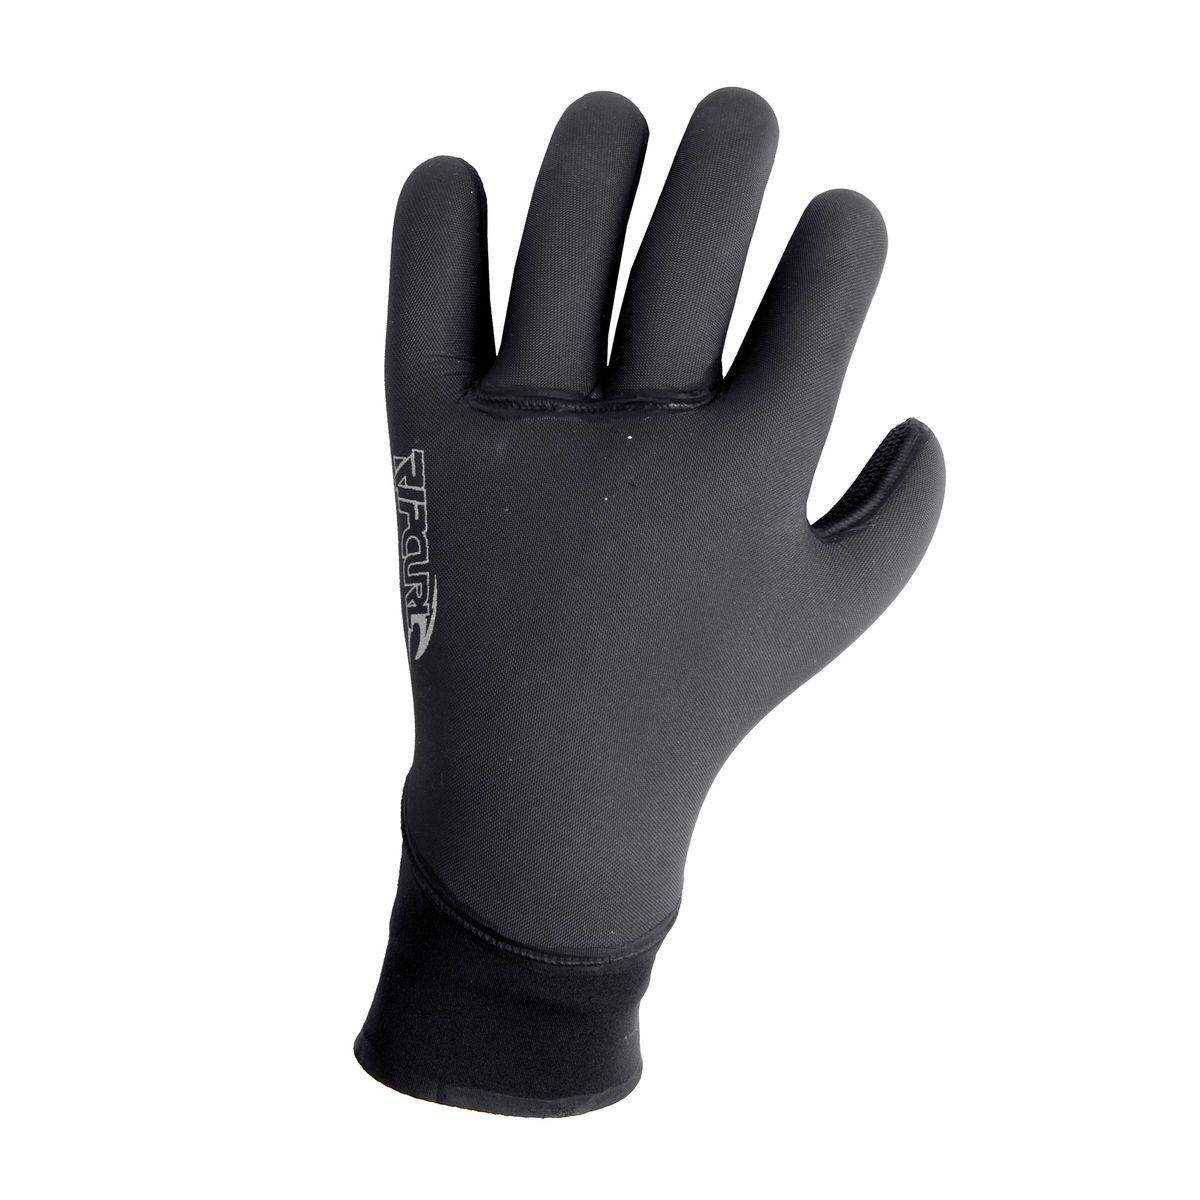 Rip Curl Flashbomb 5/3mm 5 Finger Wetsuit Gloves - Black